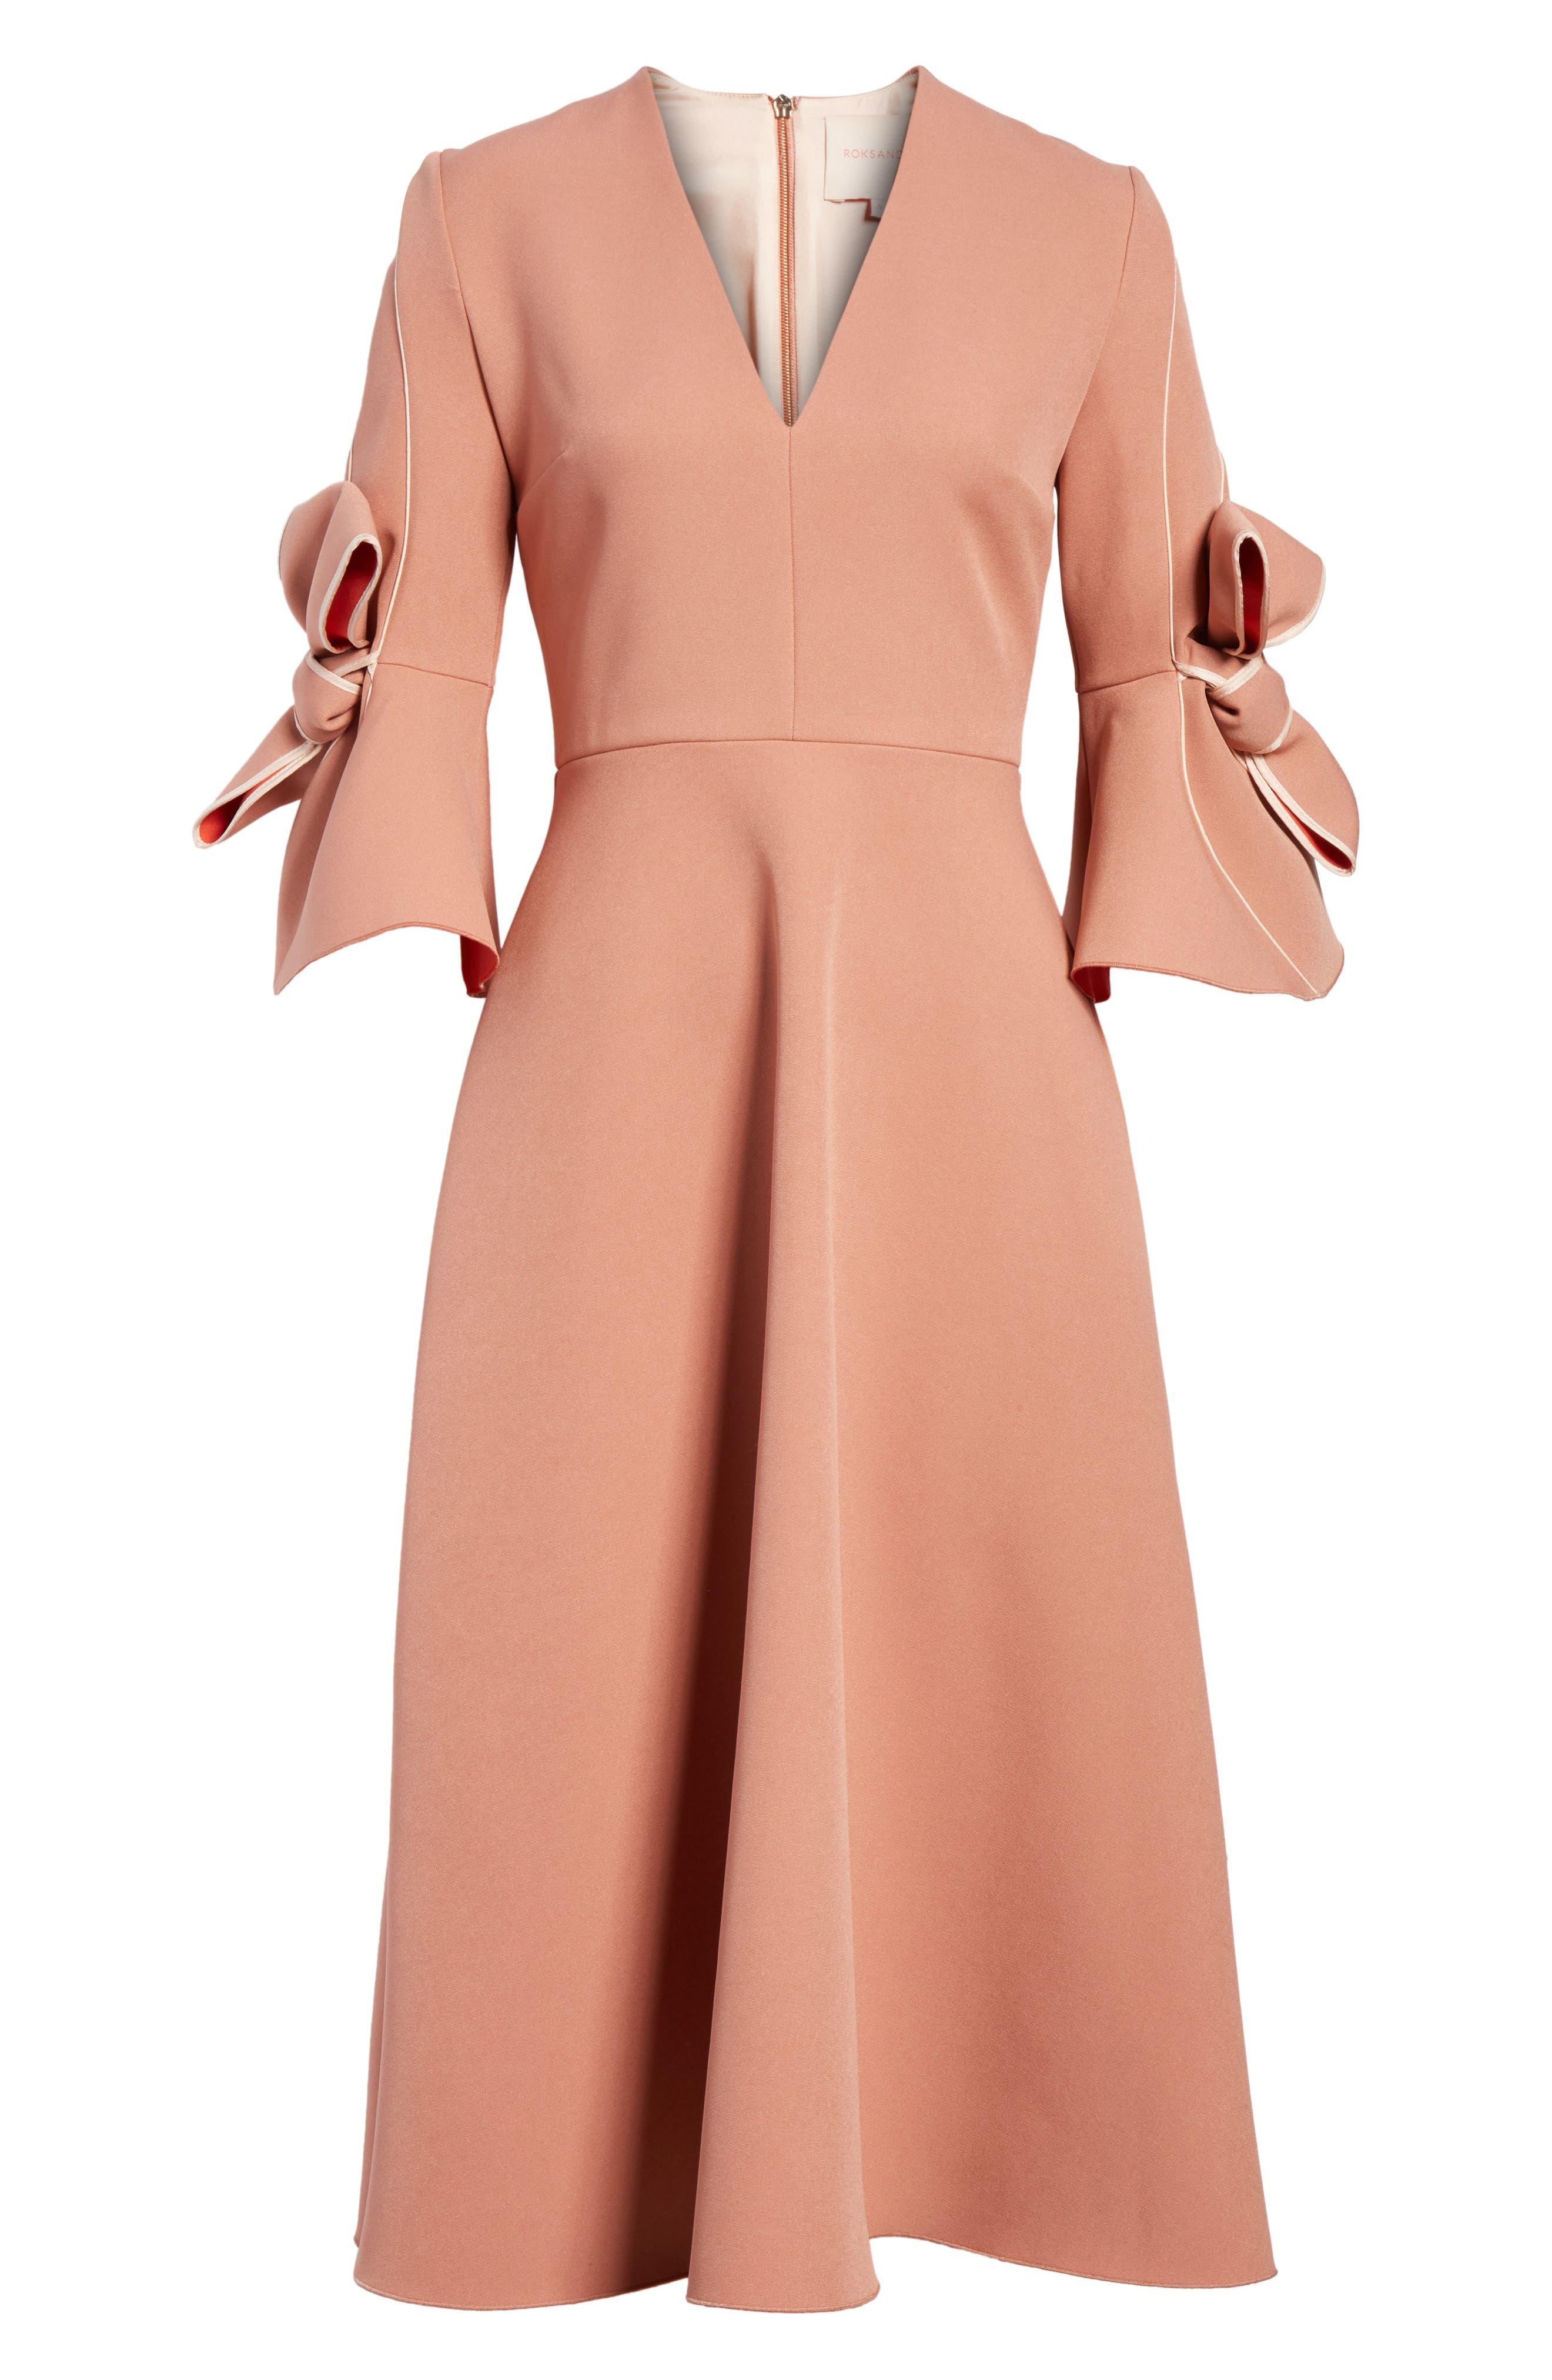 Sibella Bow Trim Dress,                             Alternate thumbnail 6, color,                             Putty